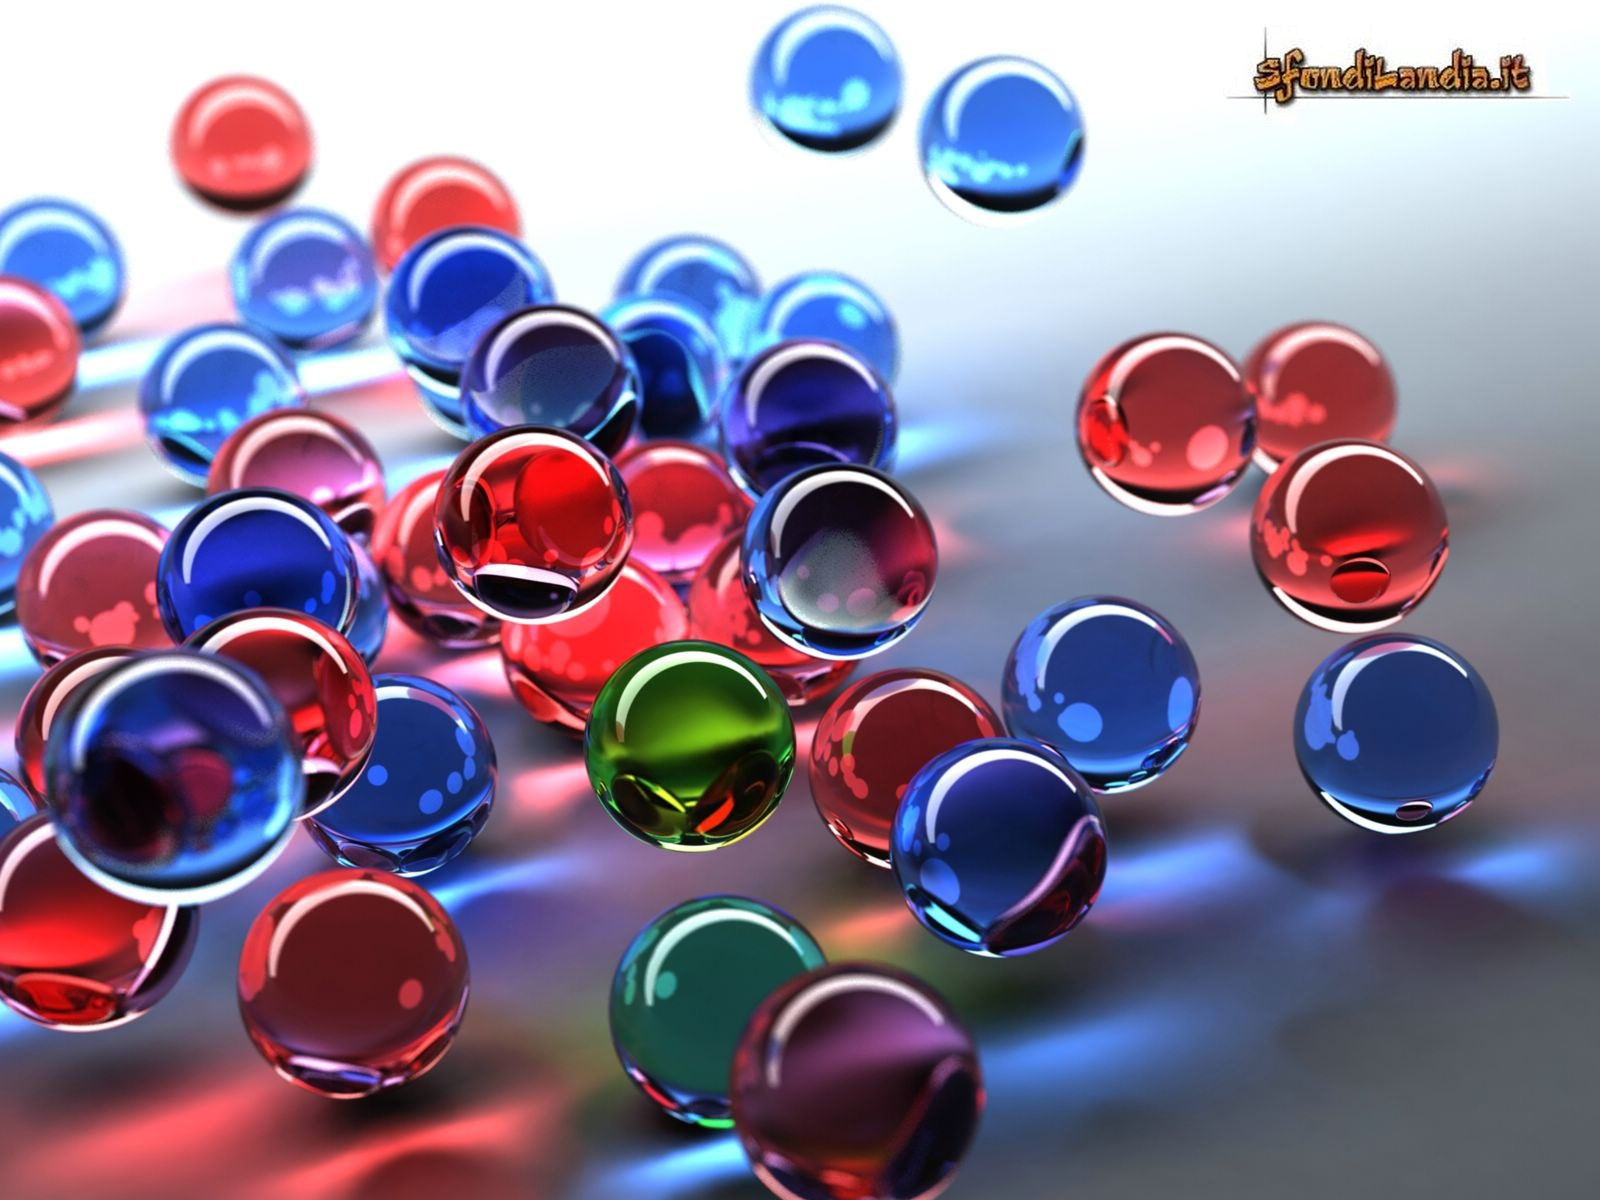 Estremamente SfondiLandia.it | Sfondo gratis di Biglie colorate per desktop  PJ05